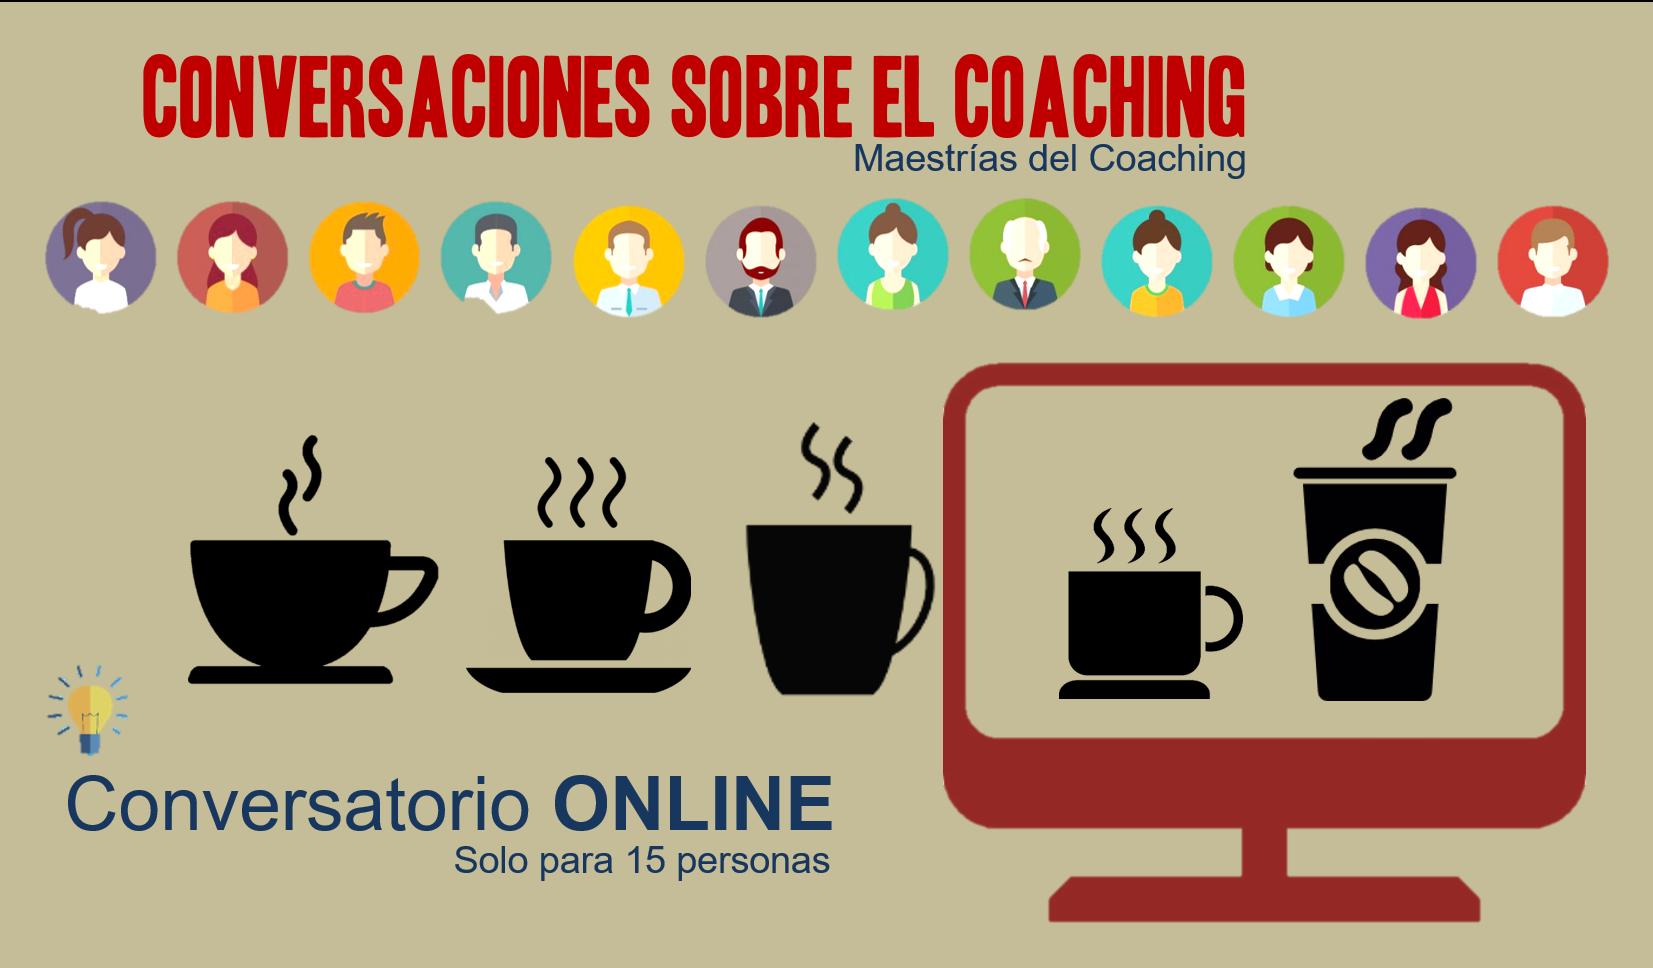 Conversaciones sobre el Coaching